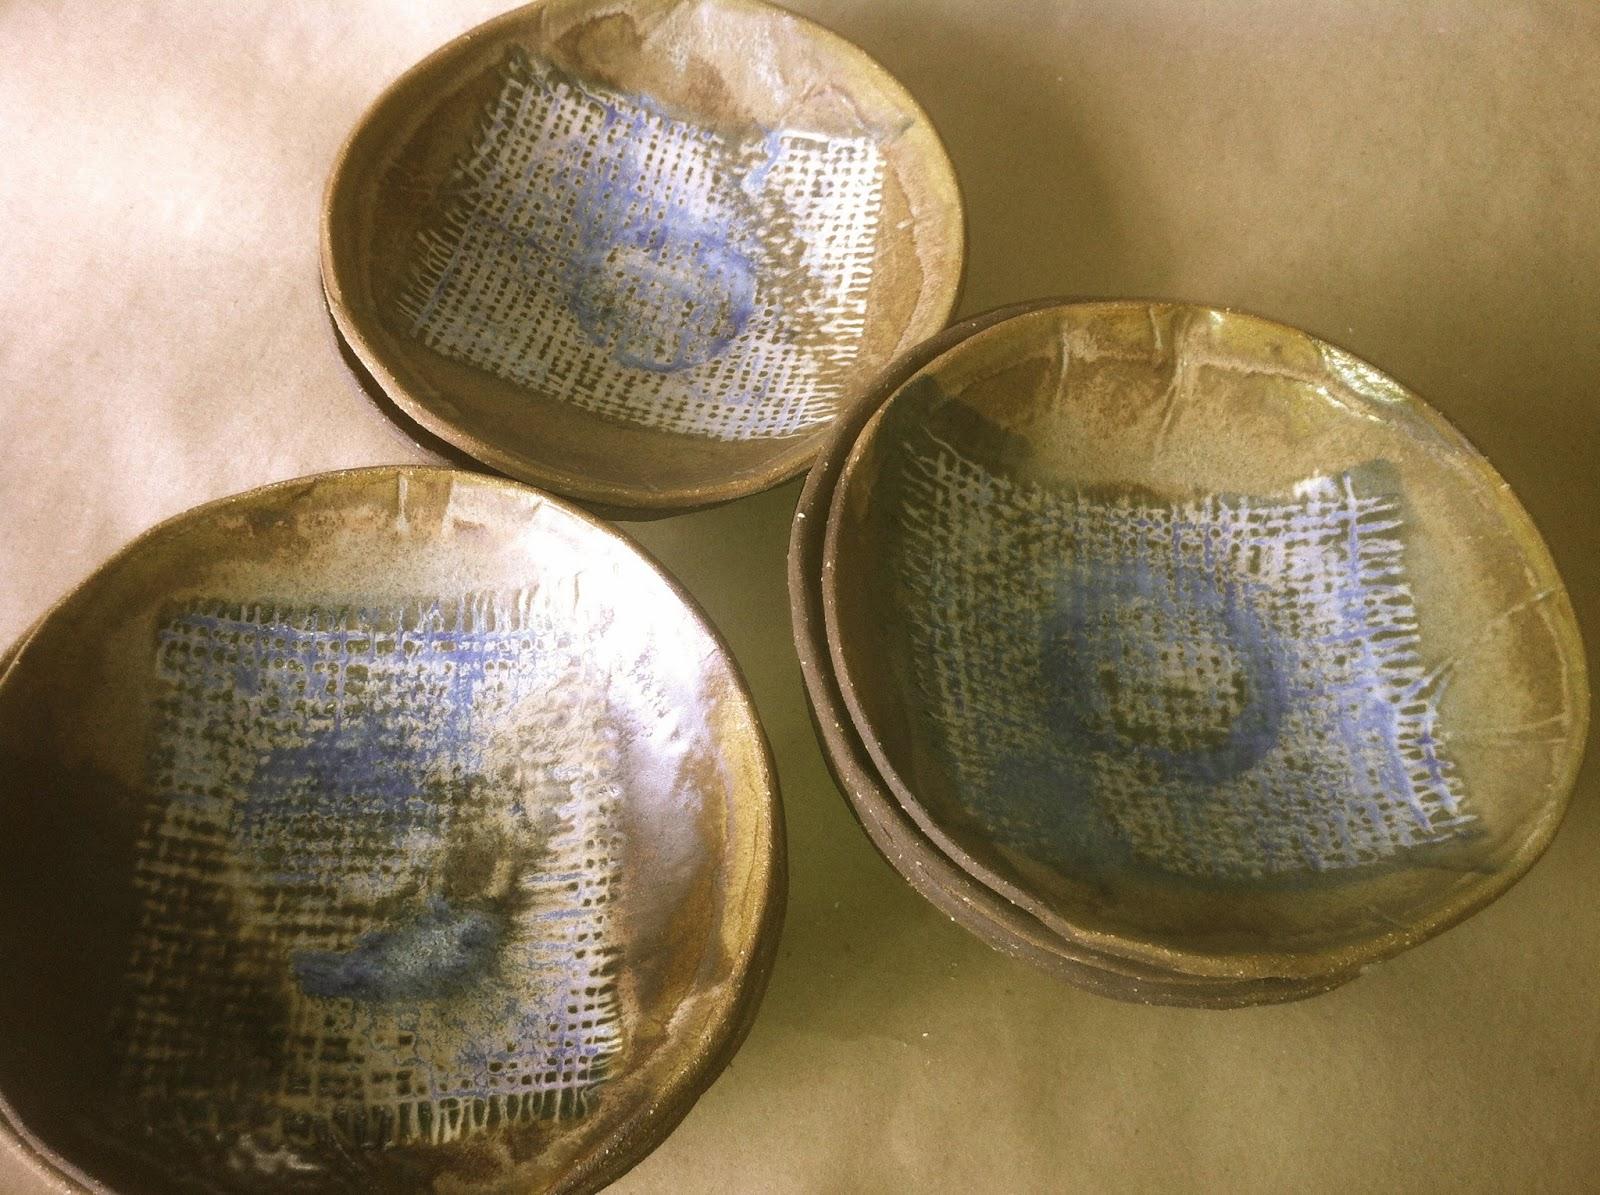 Vajilla de ceramica vajilla para el bar mut colaboraci n for Vajilla para bar